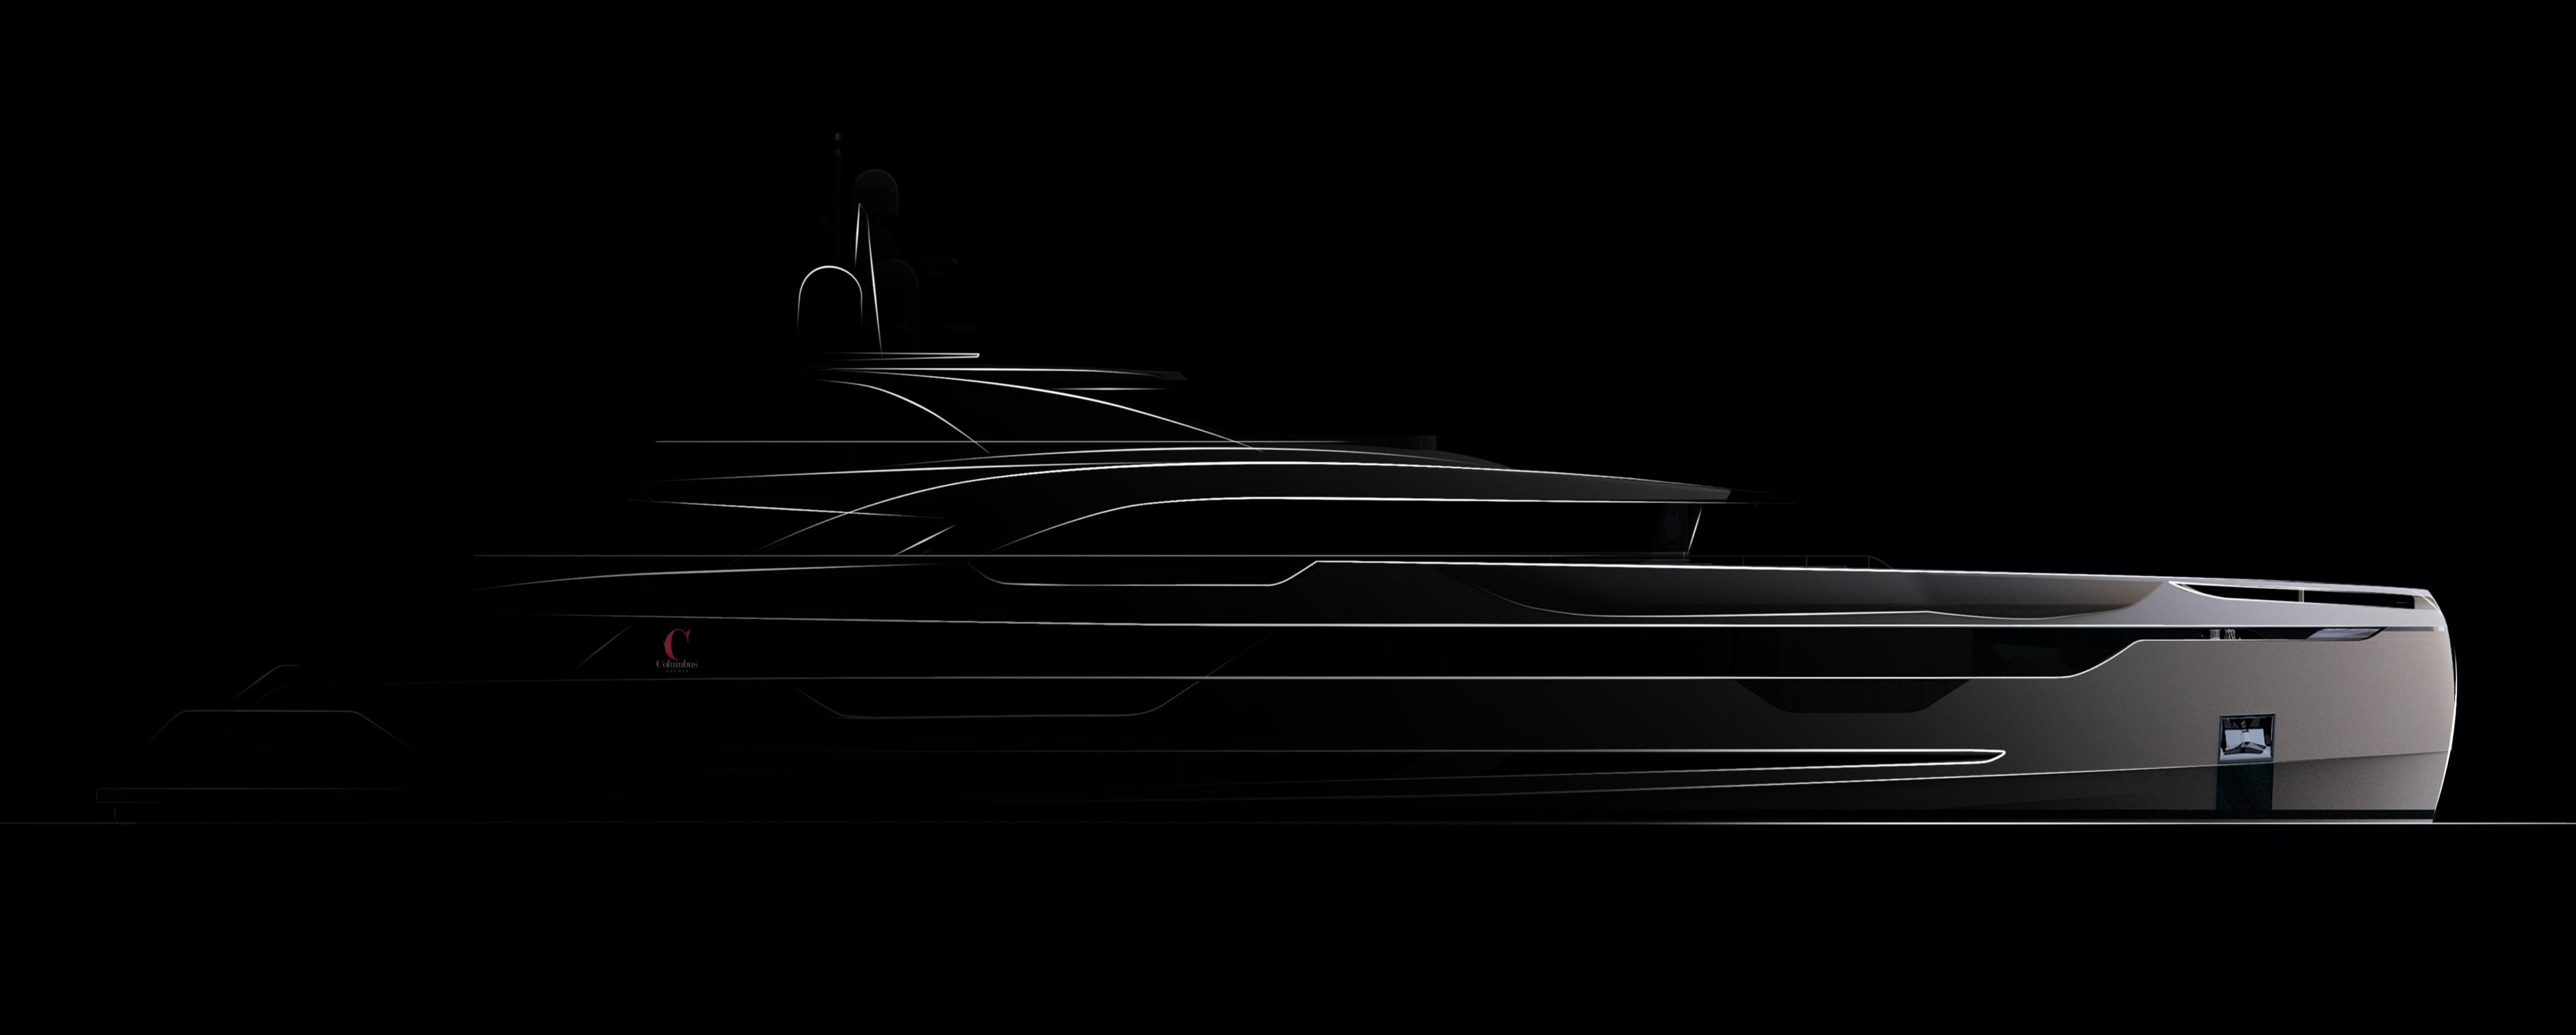 Columbus Yachts, venduto nuovo superyacht Custom 50 metri 'Lady'